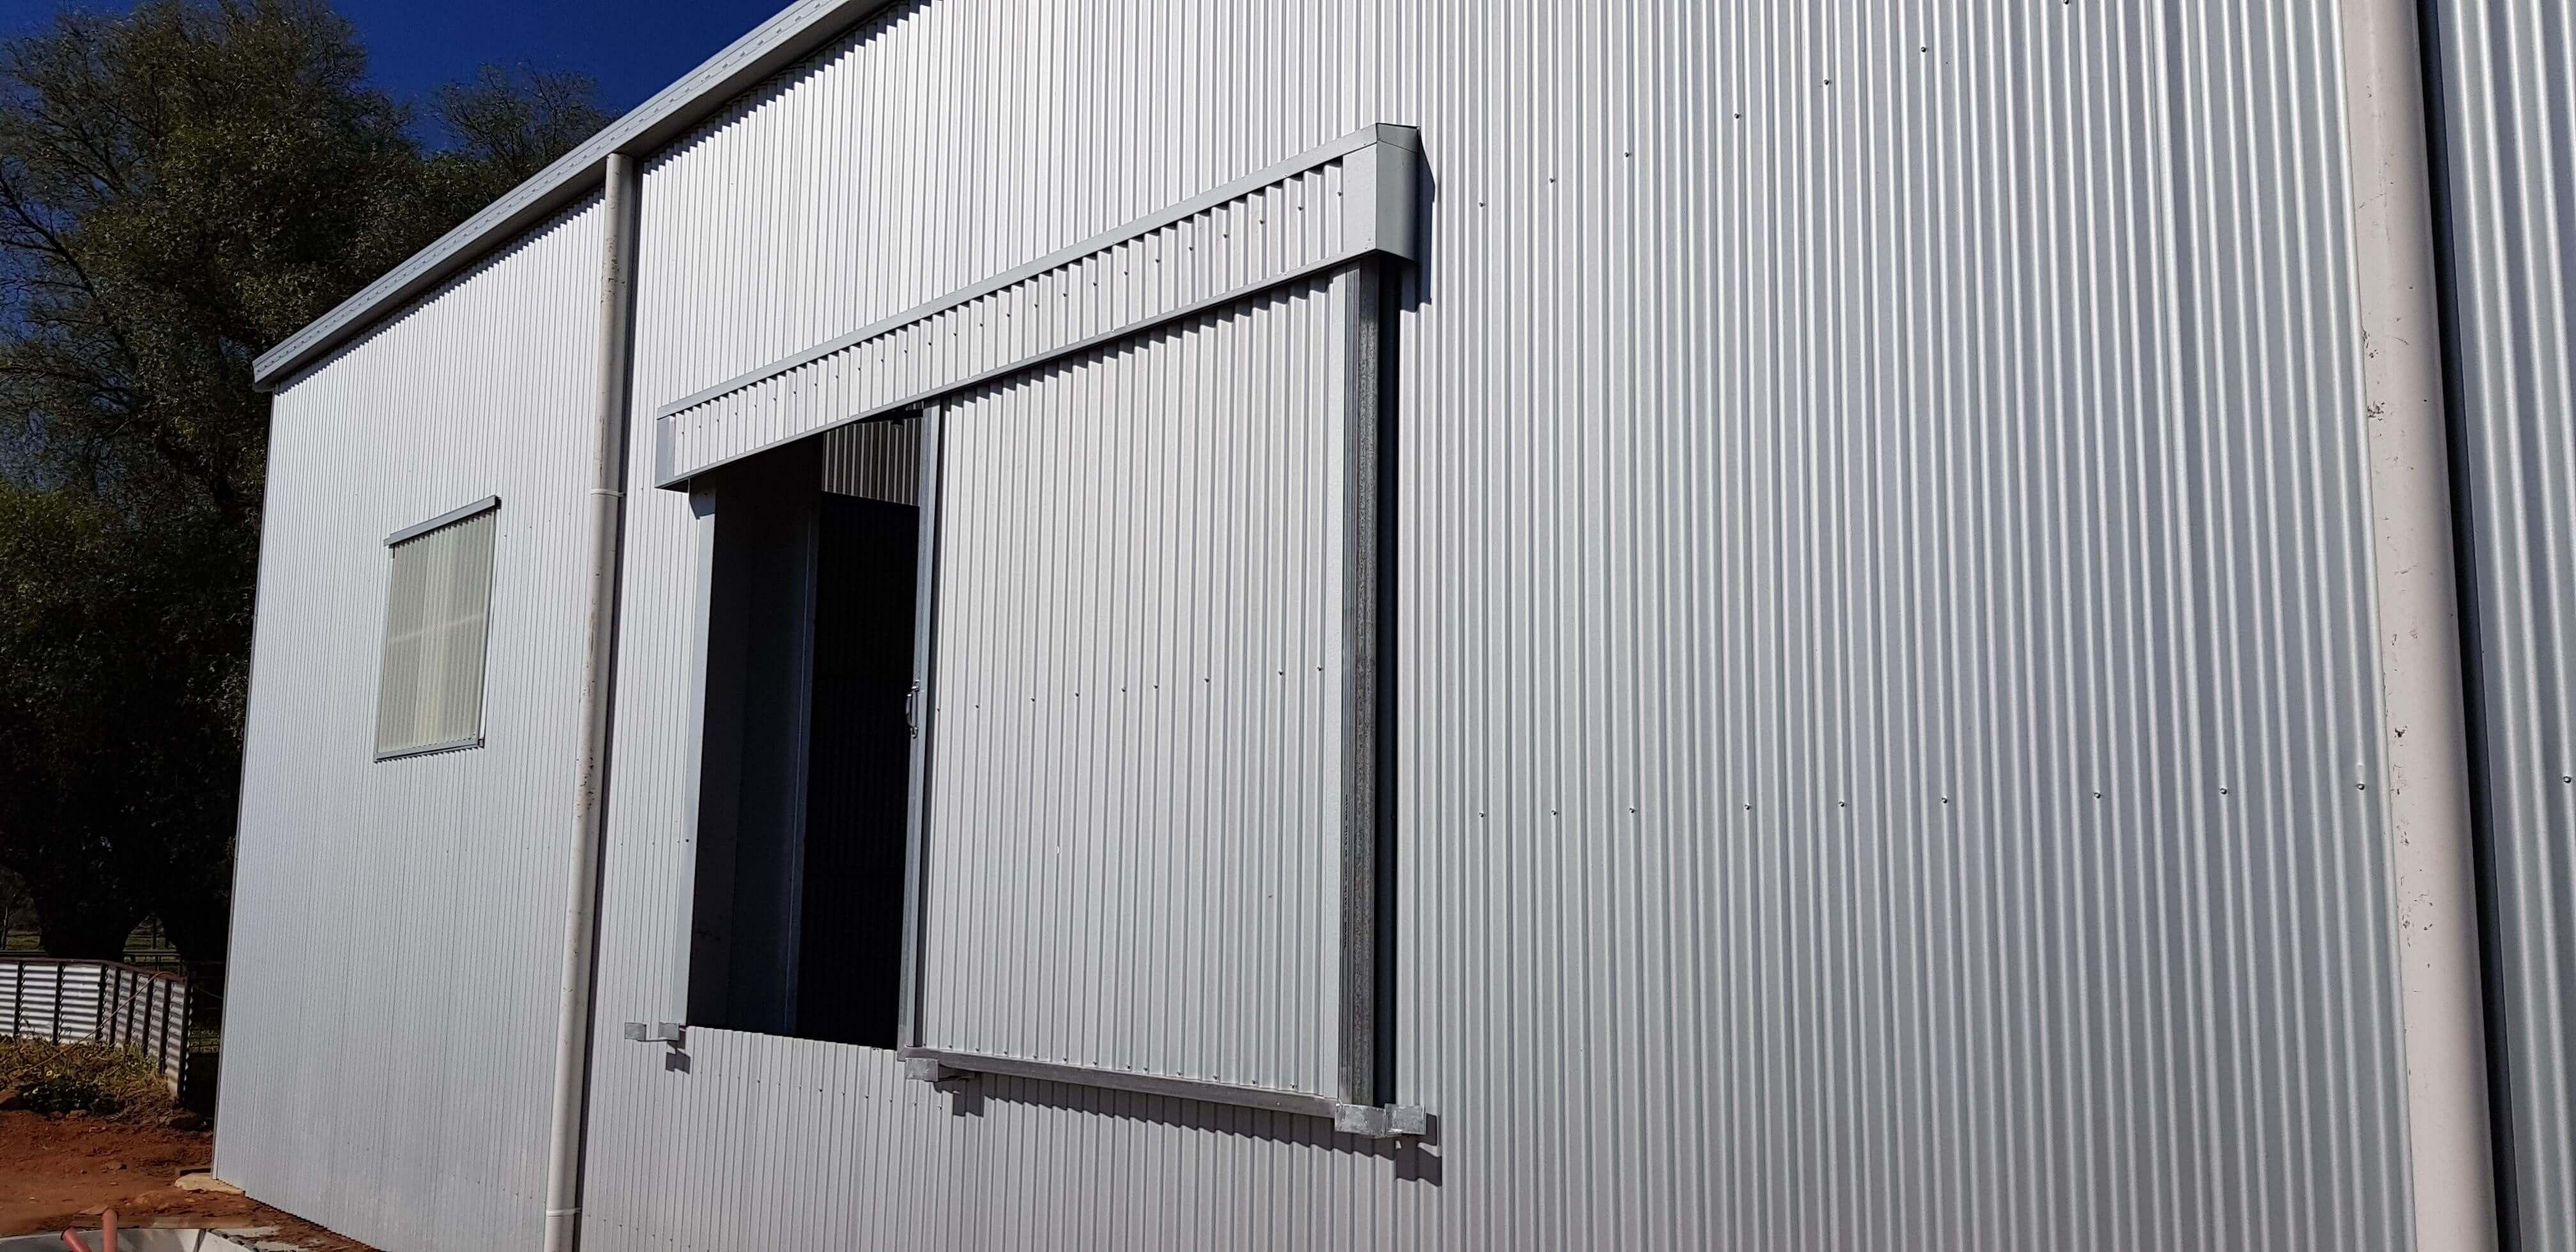 Shearing shed with sliding windows